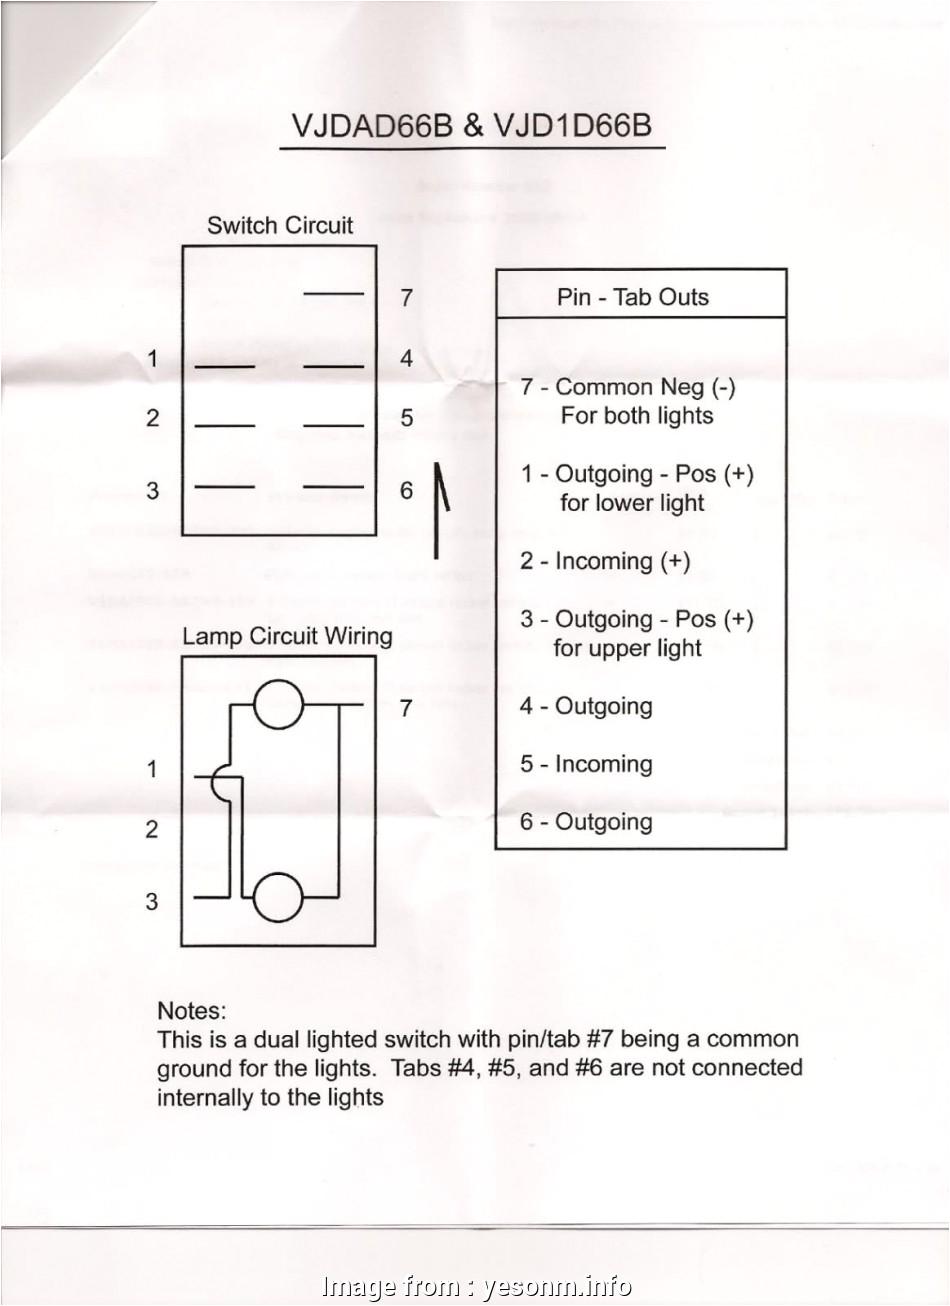 4 Pin Carling Switch Wiring Diagram Rocker Switch Wiring 4 Pin Cleaver Carling Technologies